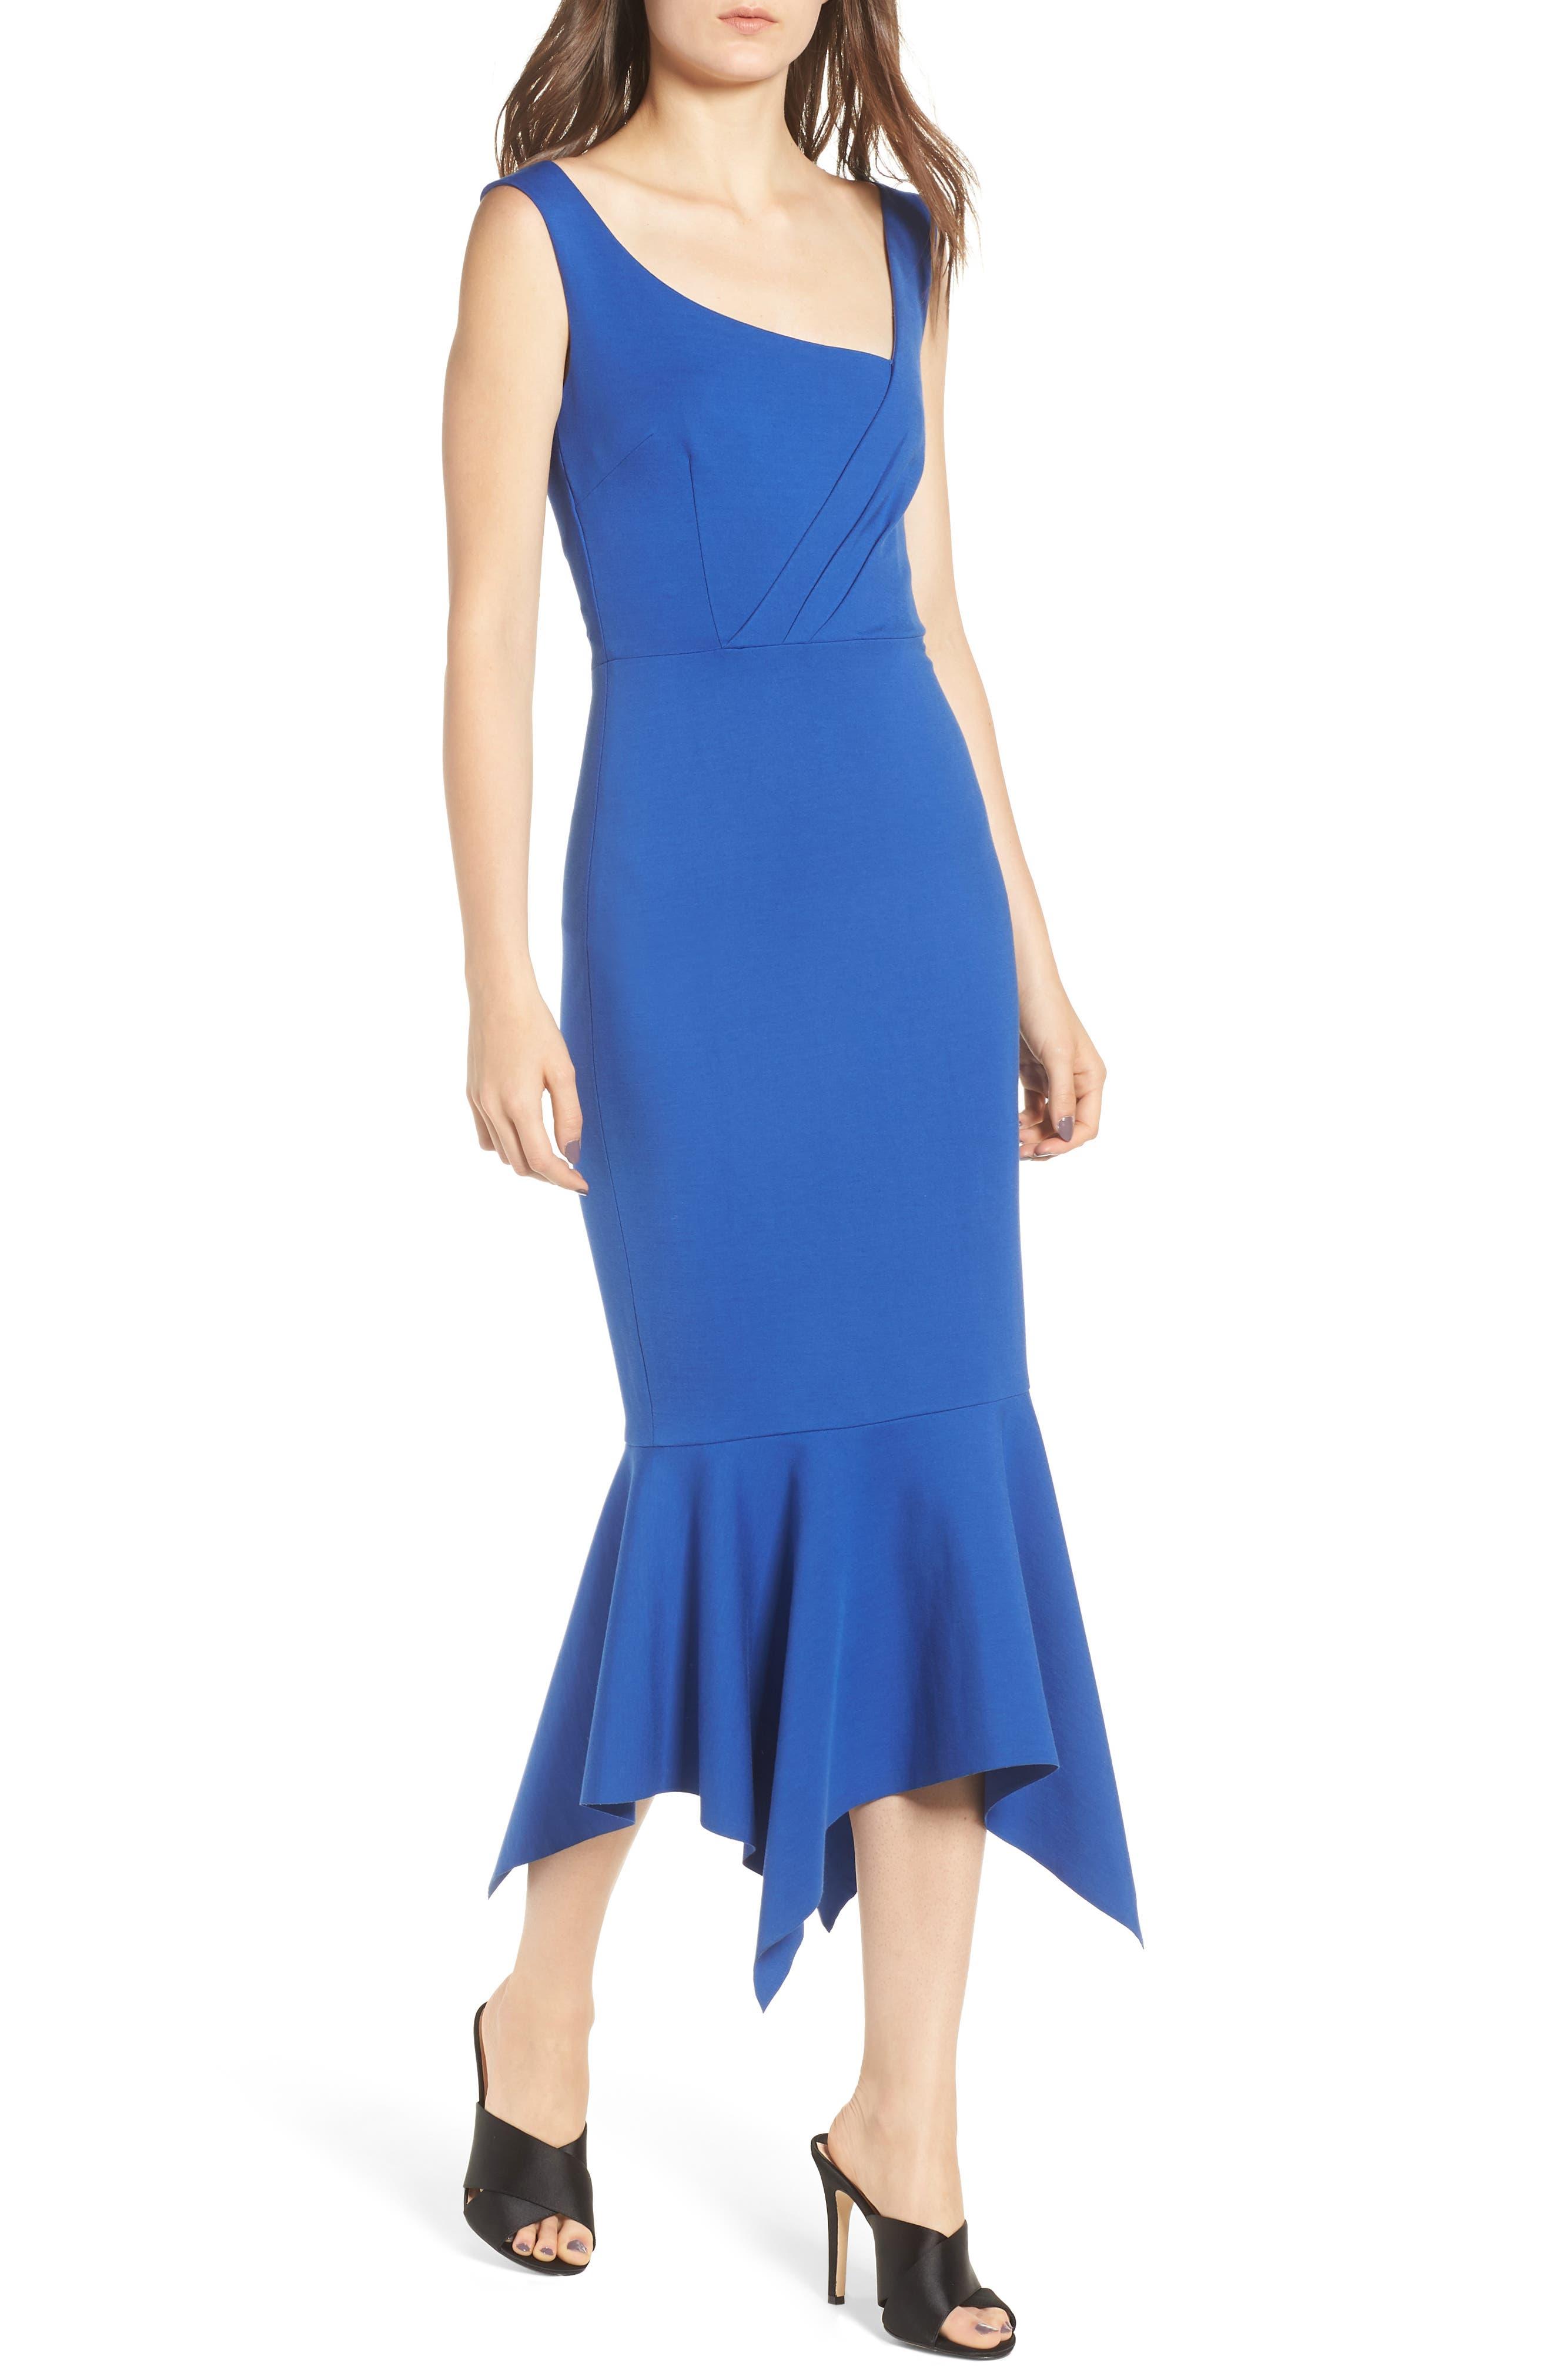 Viola Asymmetrical Dress,                         Main,                         color, 460